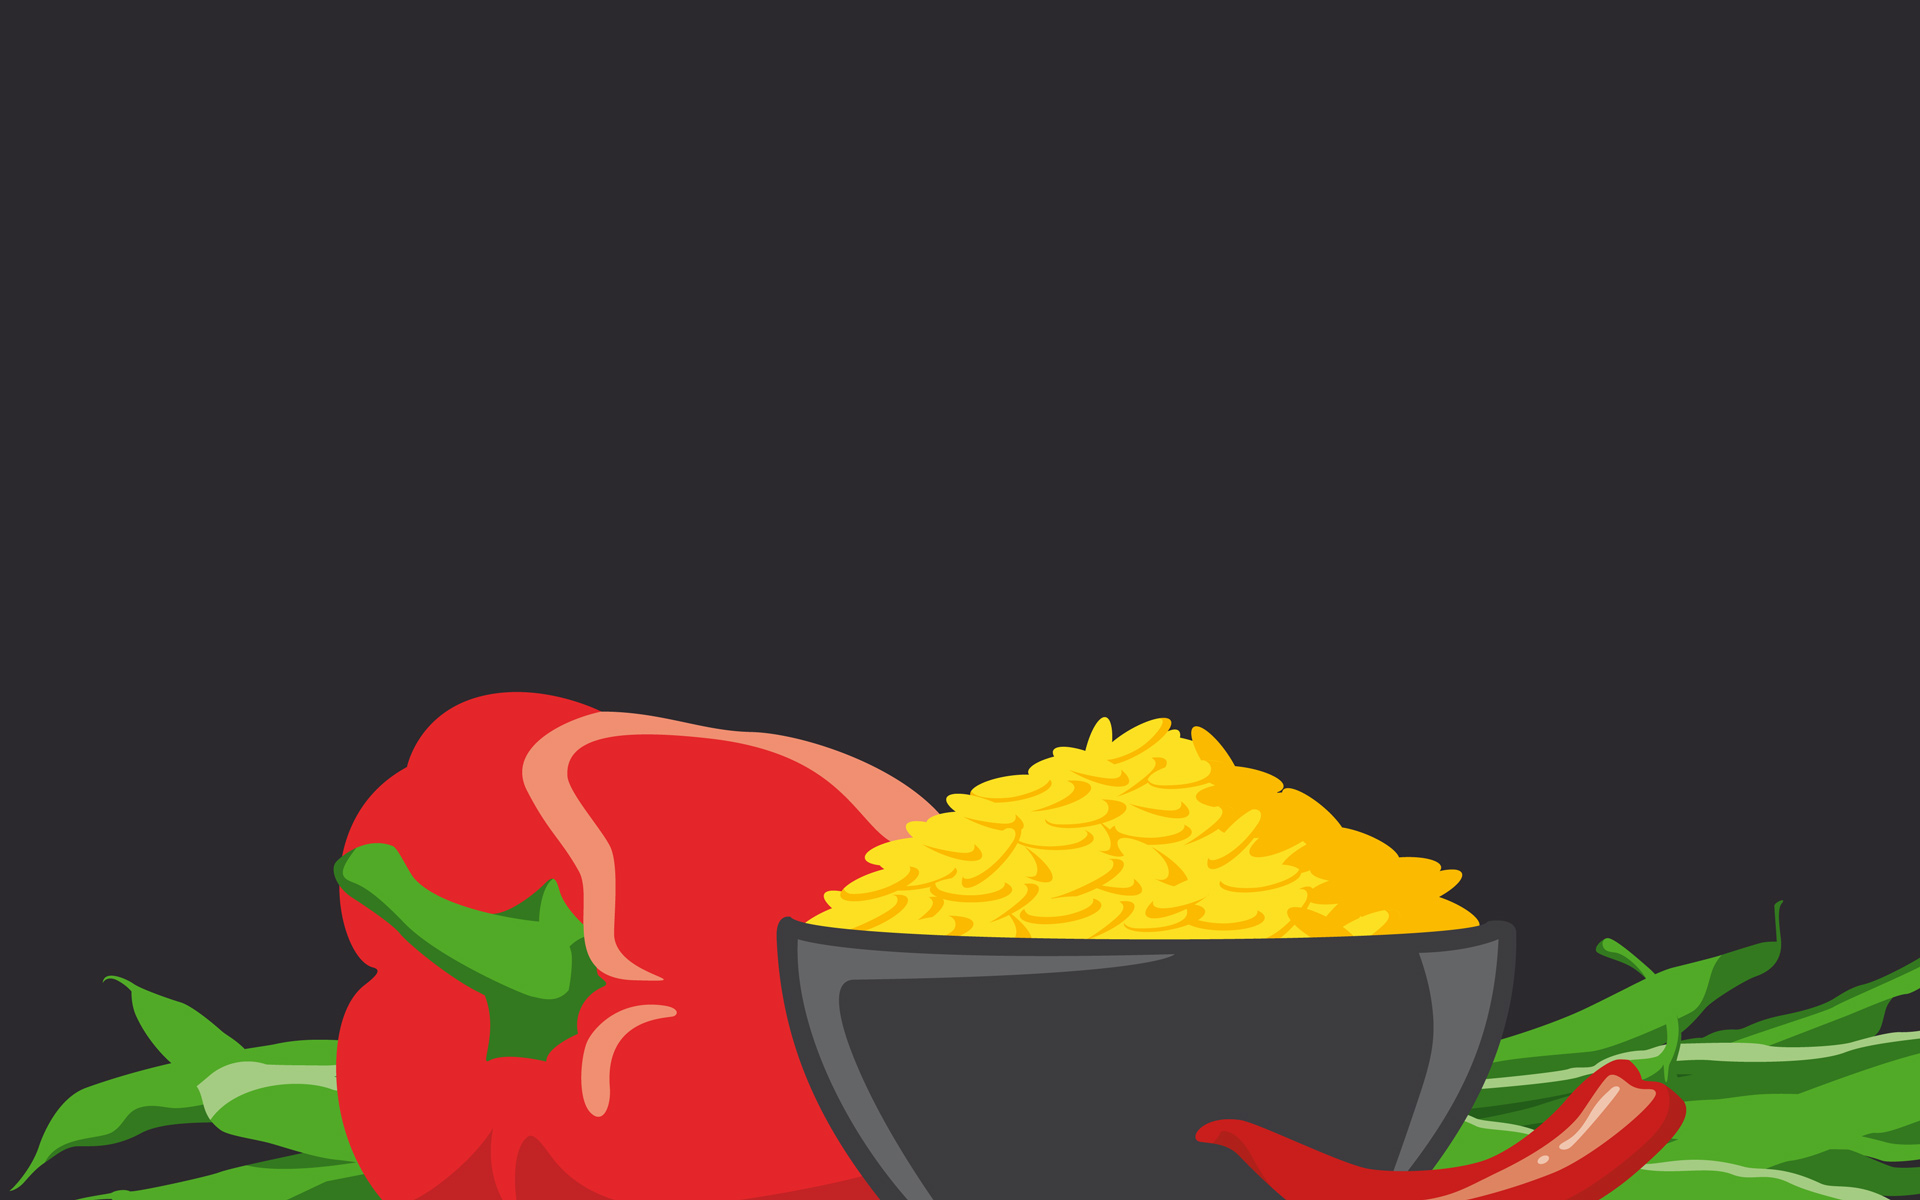 youcook Brand Identity, Illustration, Bali Nasi Goreng